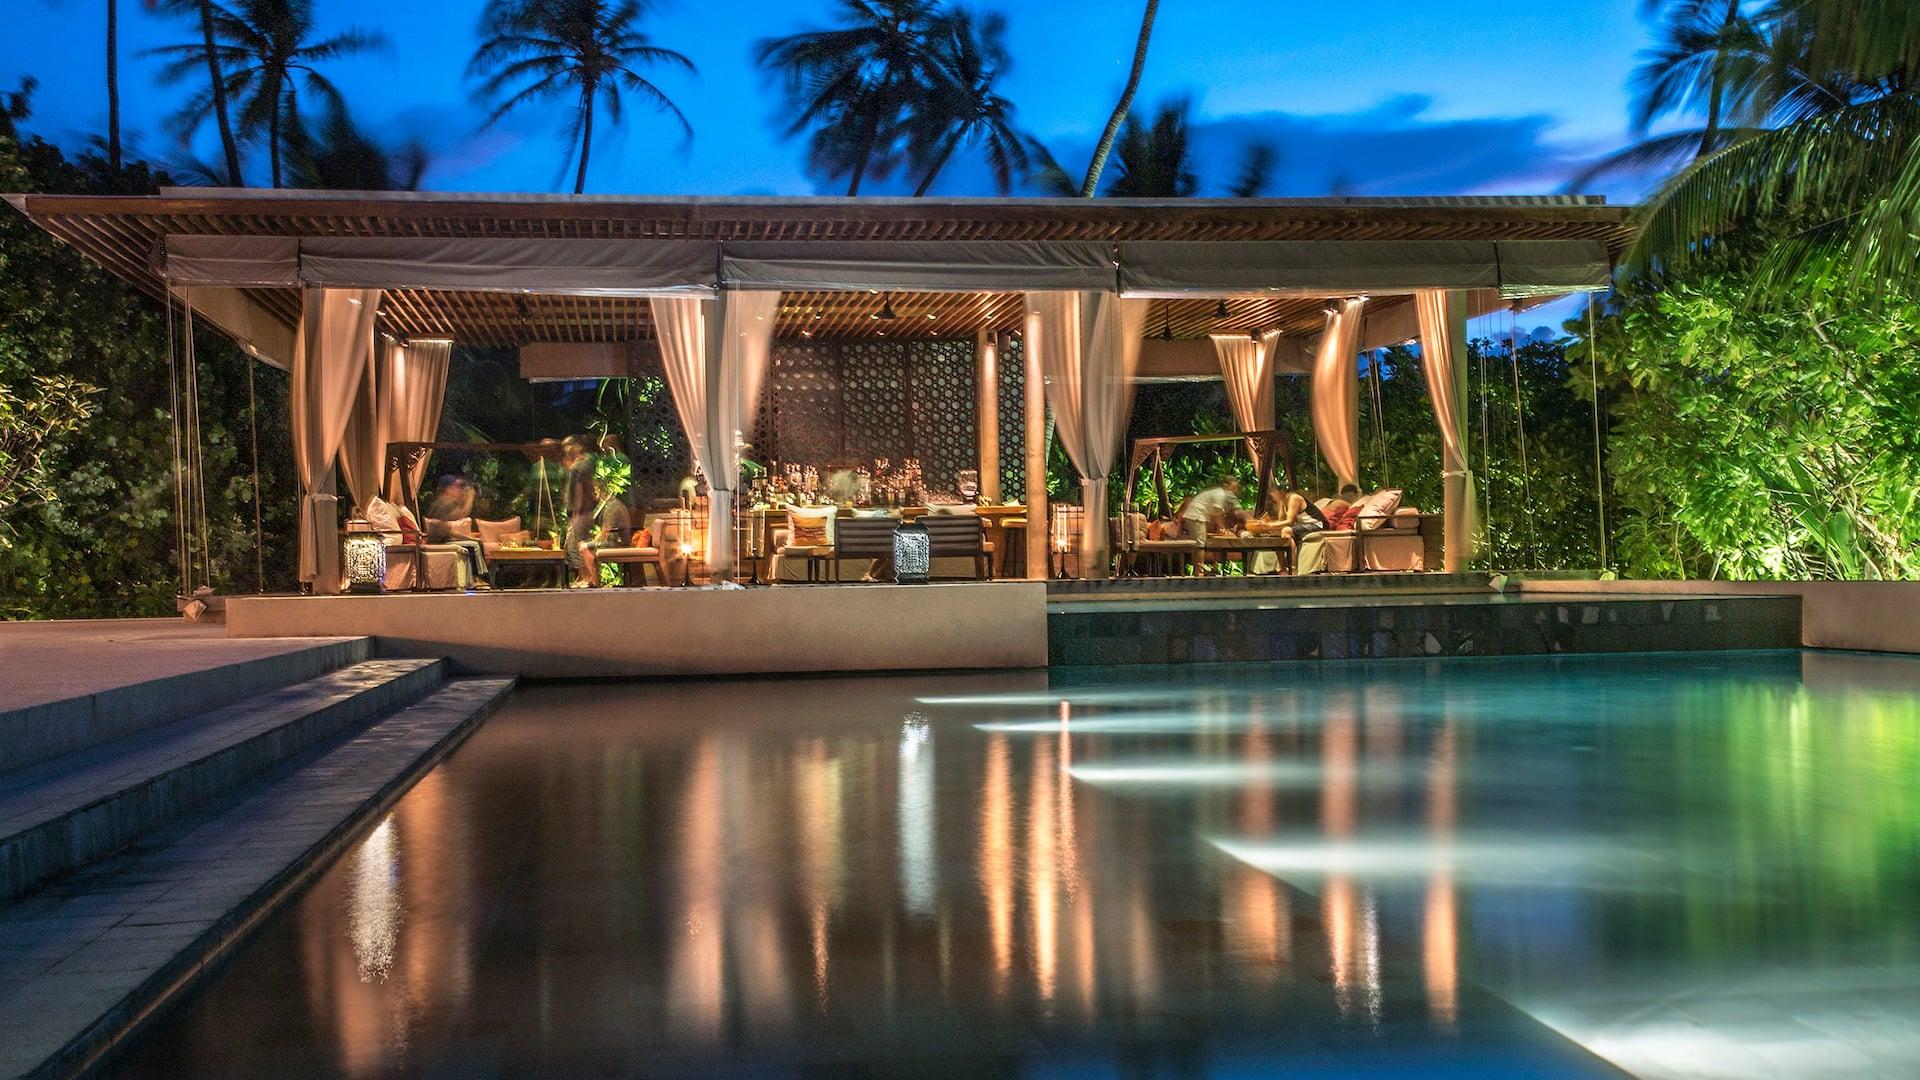 Luxury Maldives Resort Bar and pool